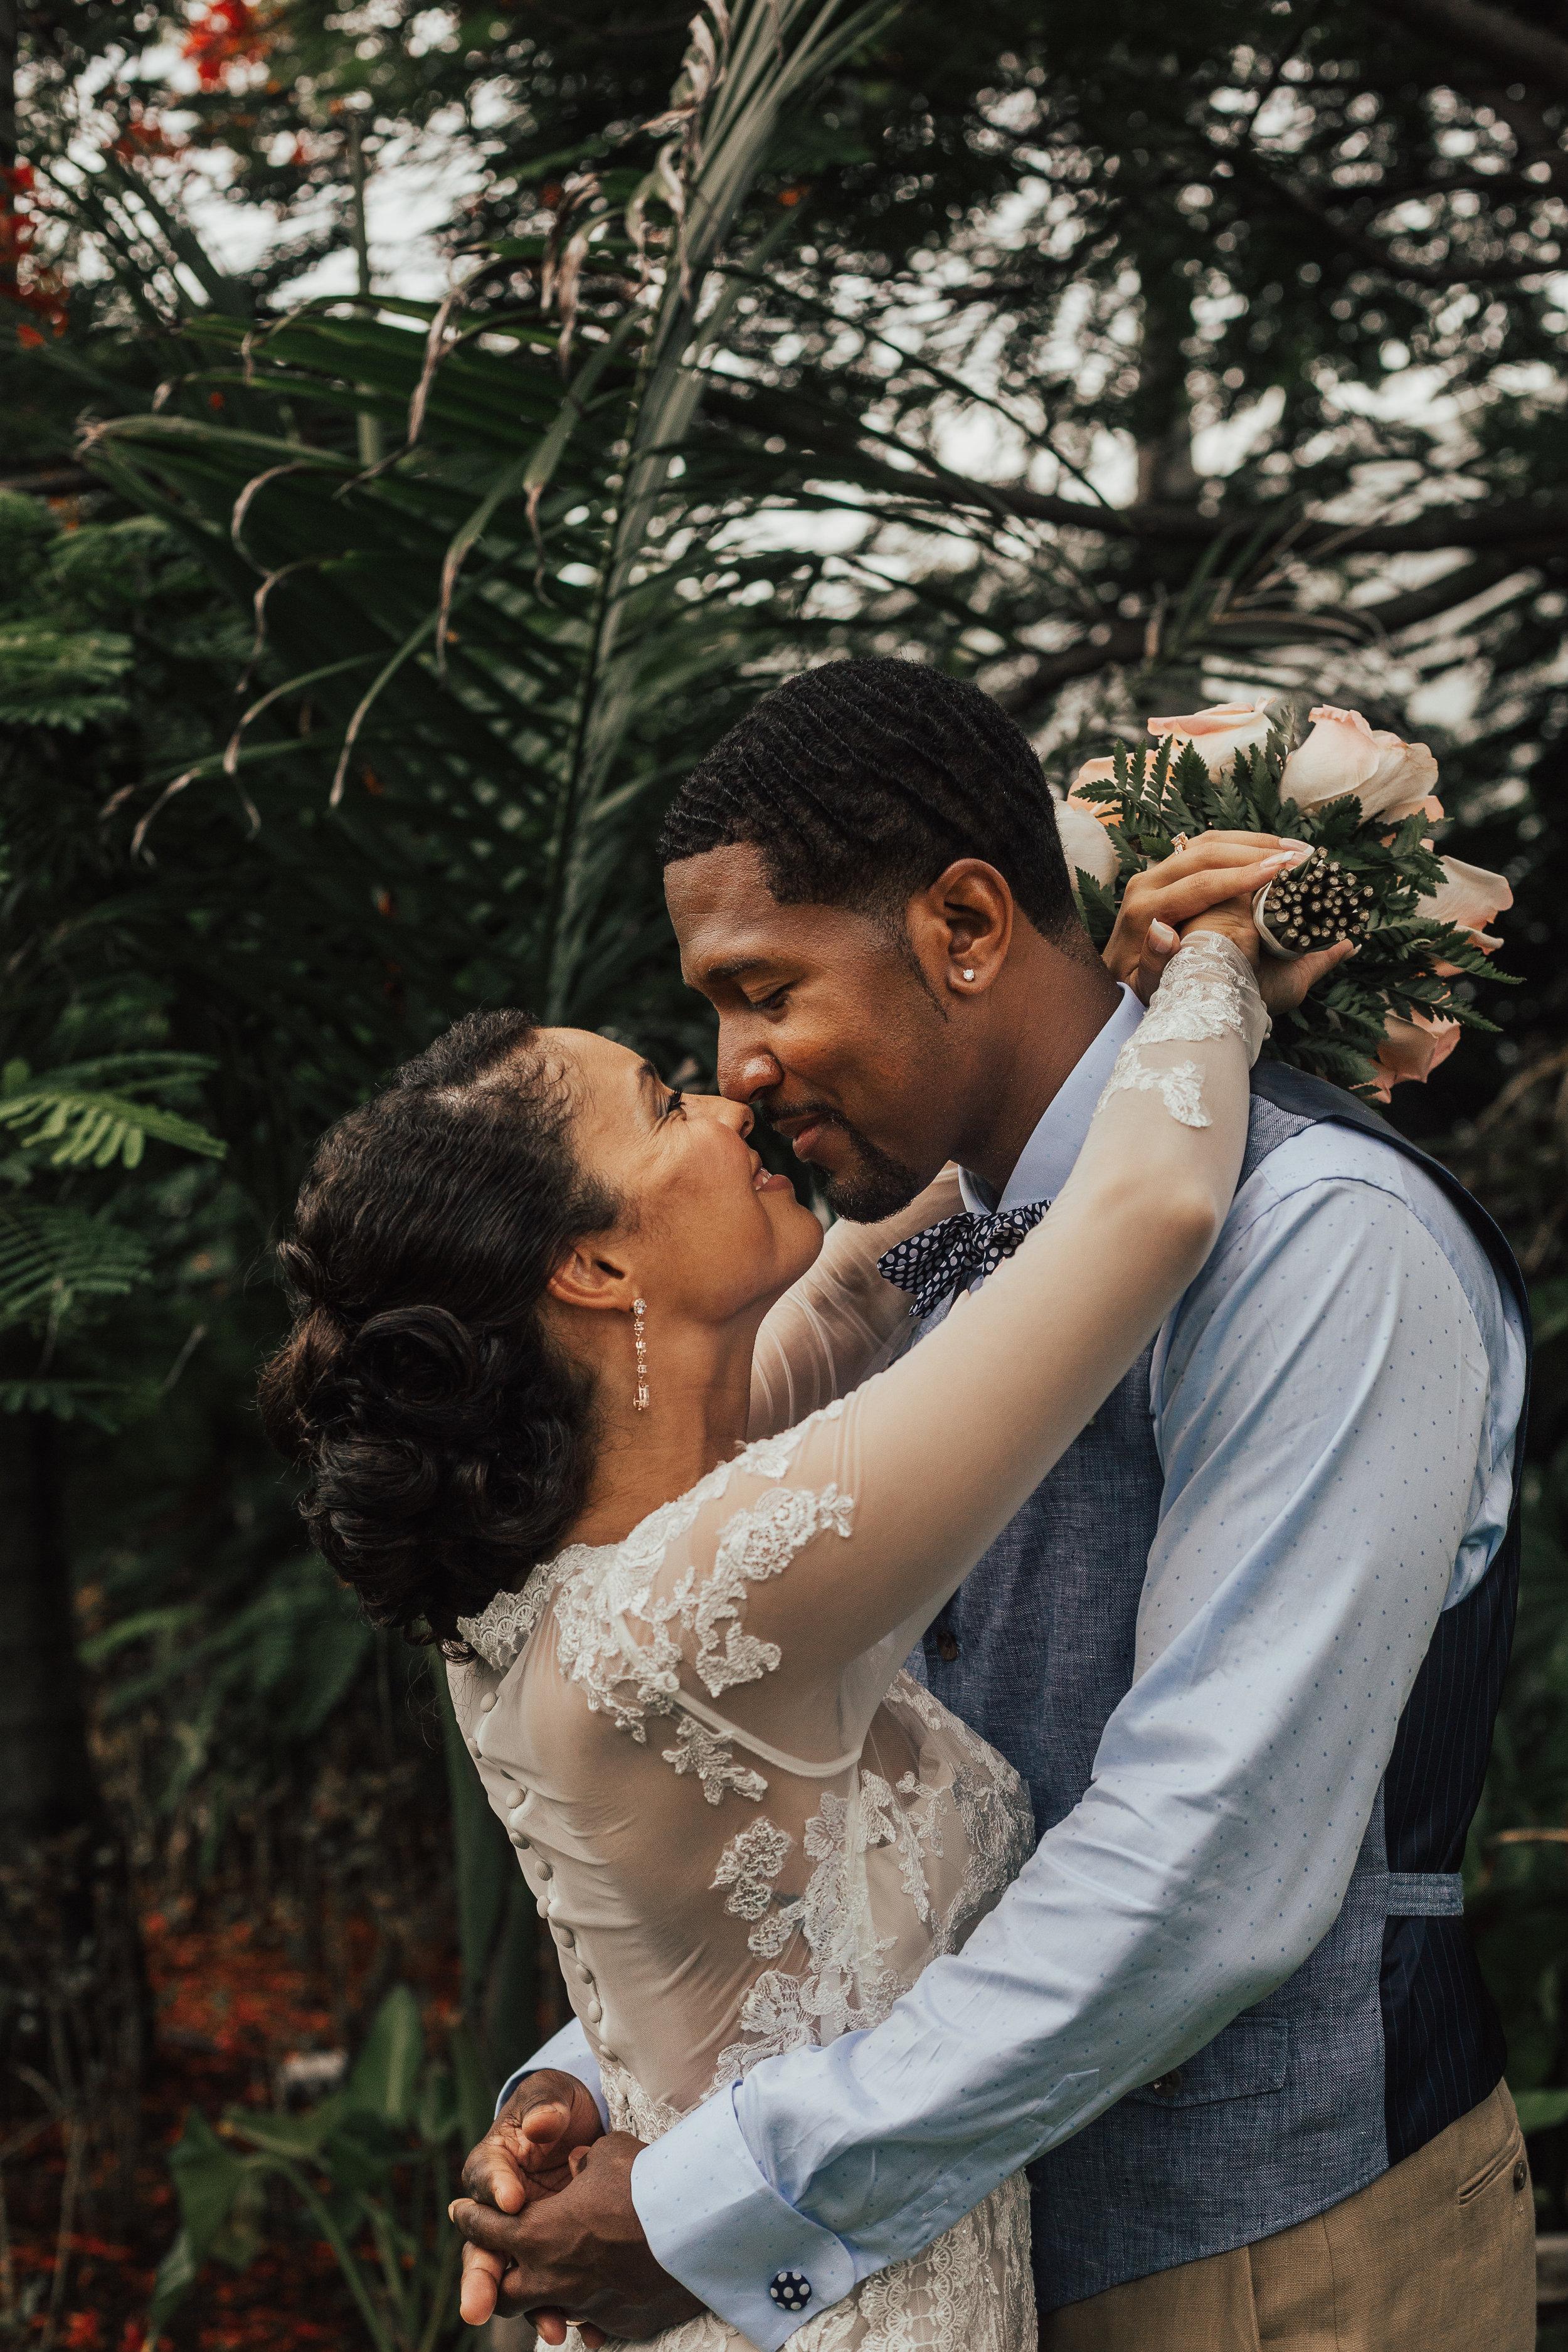 Destination-Wedding-Photographer-cleveland-wedding-photographer-elopement-photographer-elope-elopemene-bali